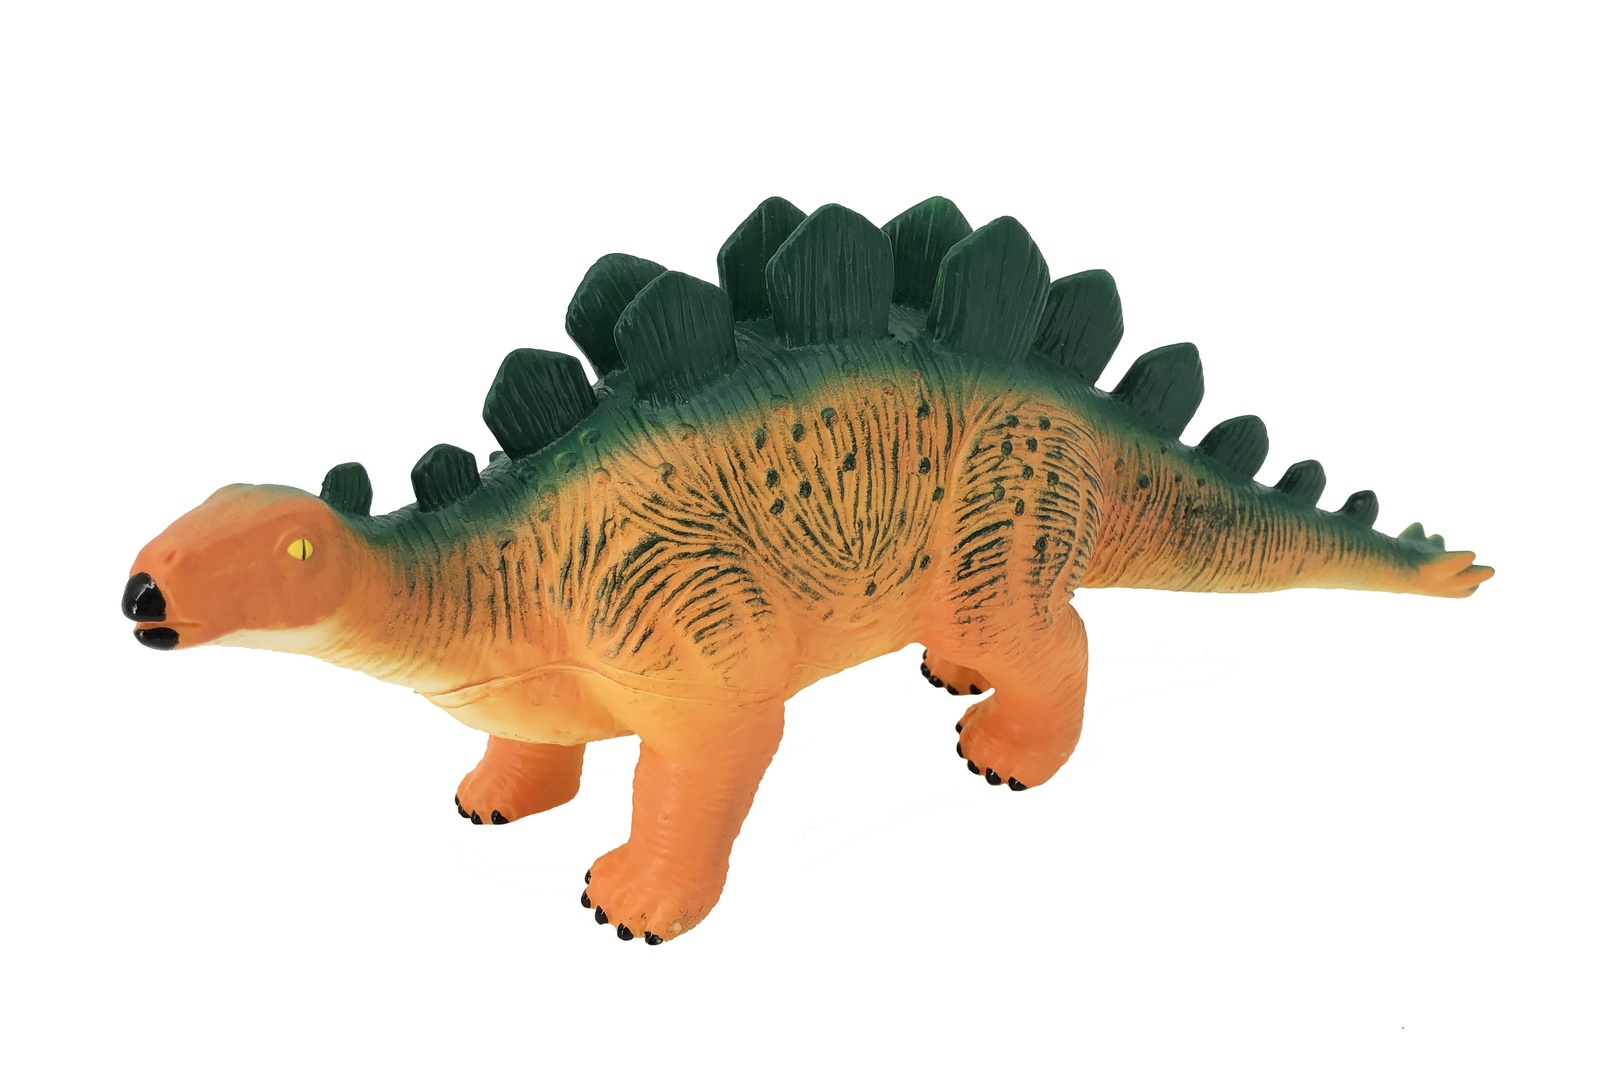 Фигурка АБВГДЕЙКА Динозавр Стегозавр, PE0004, 29 см зеленый, желтый